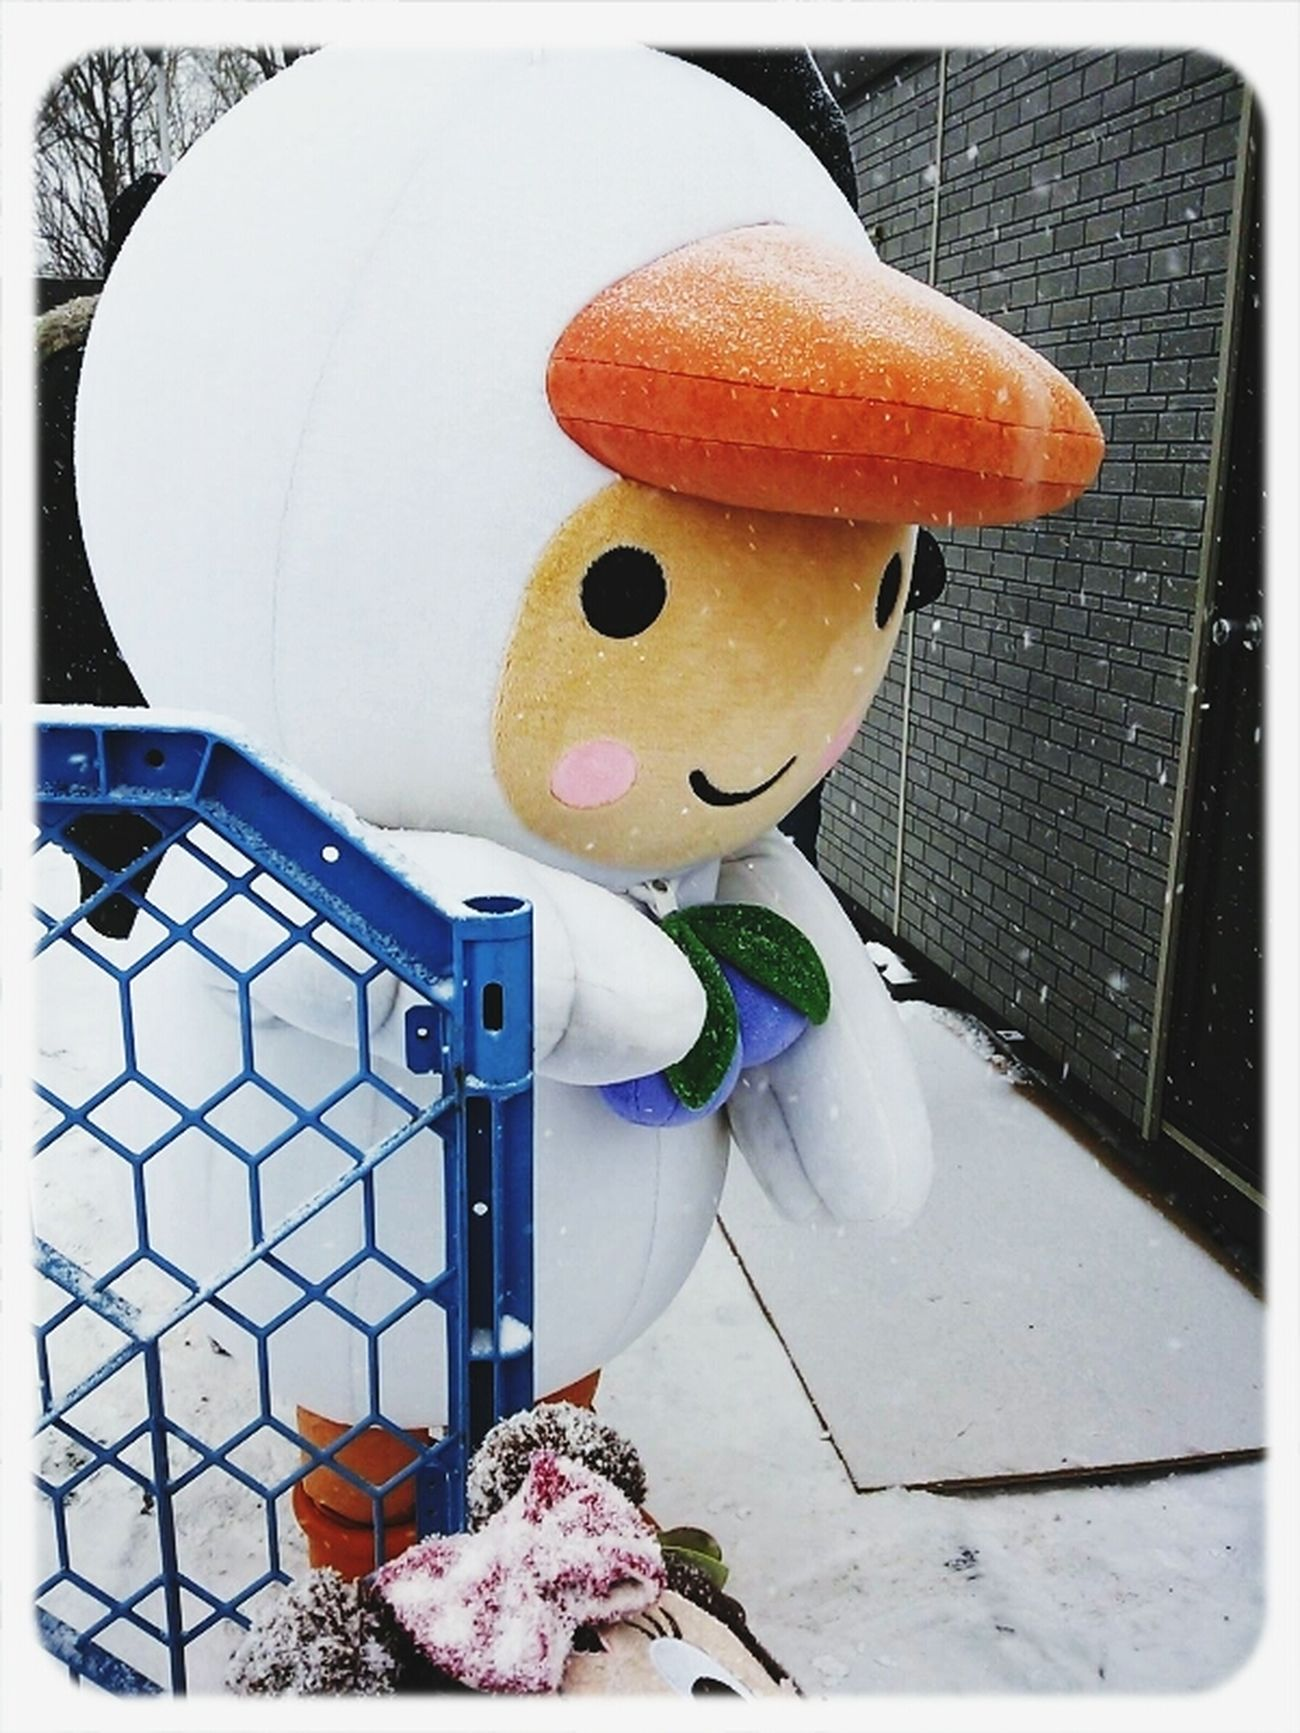 Tomachop Japan Mascot Characters Of JAPAN 地元のスケート祭りでのとまチョップ(・ω・)。